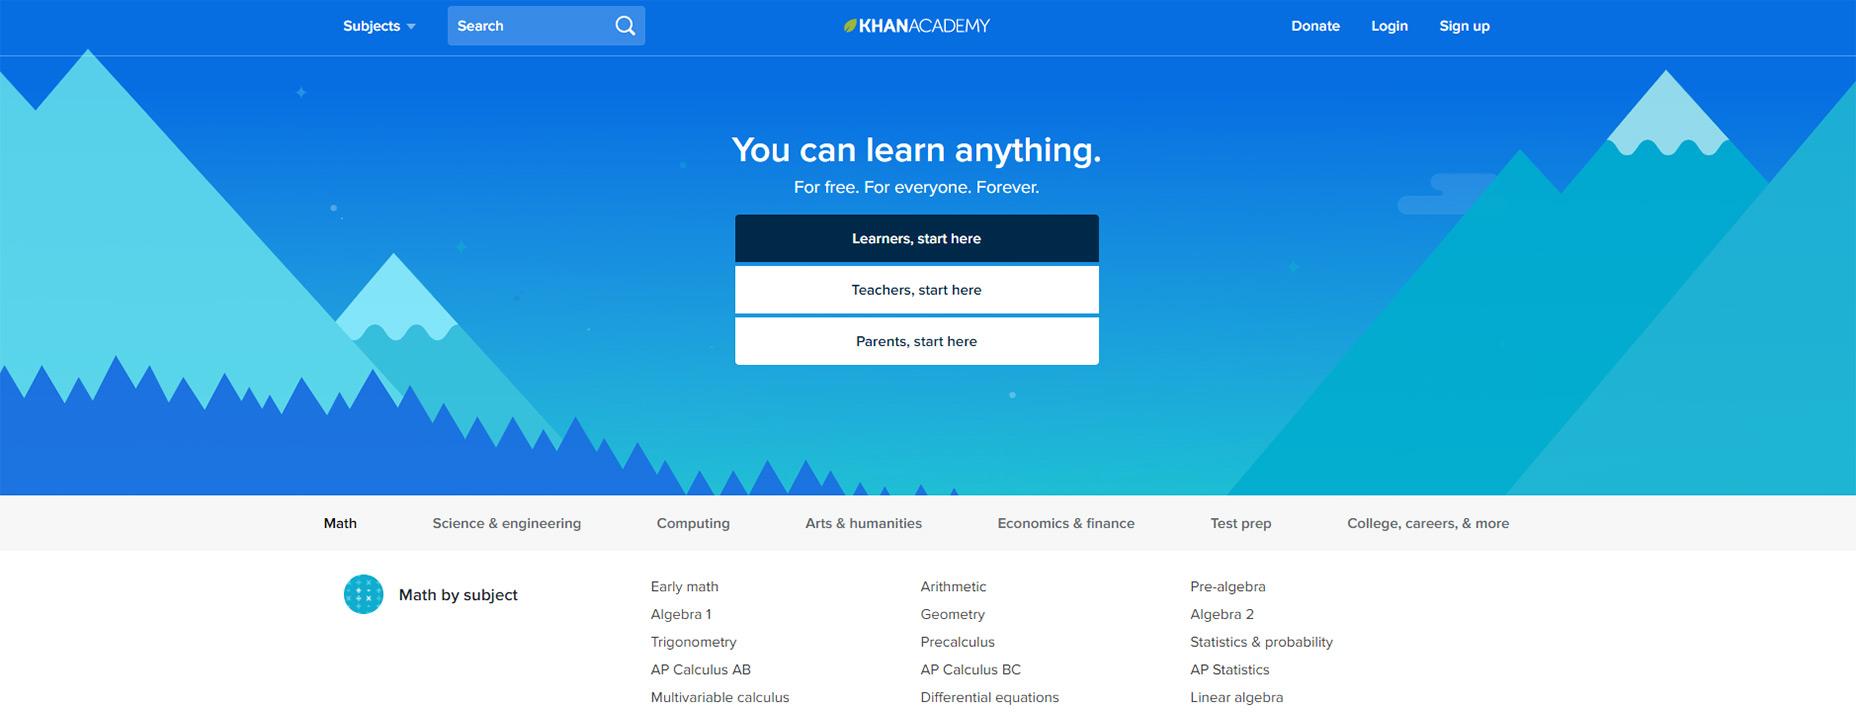 09-khan-academy-homepage